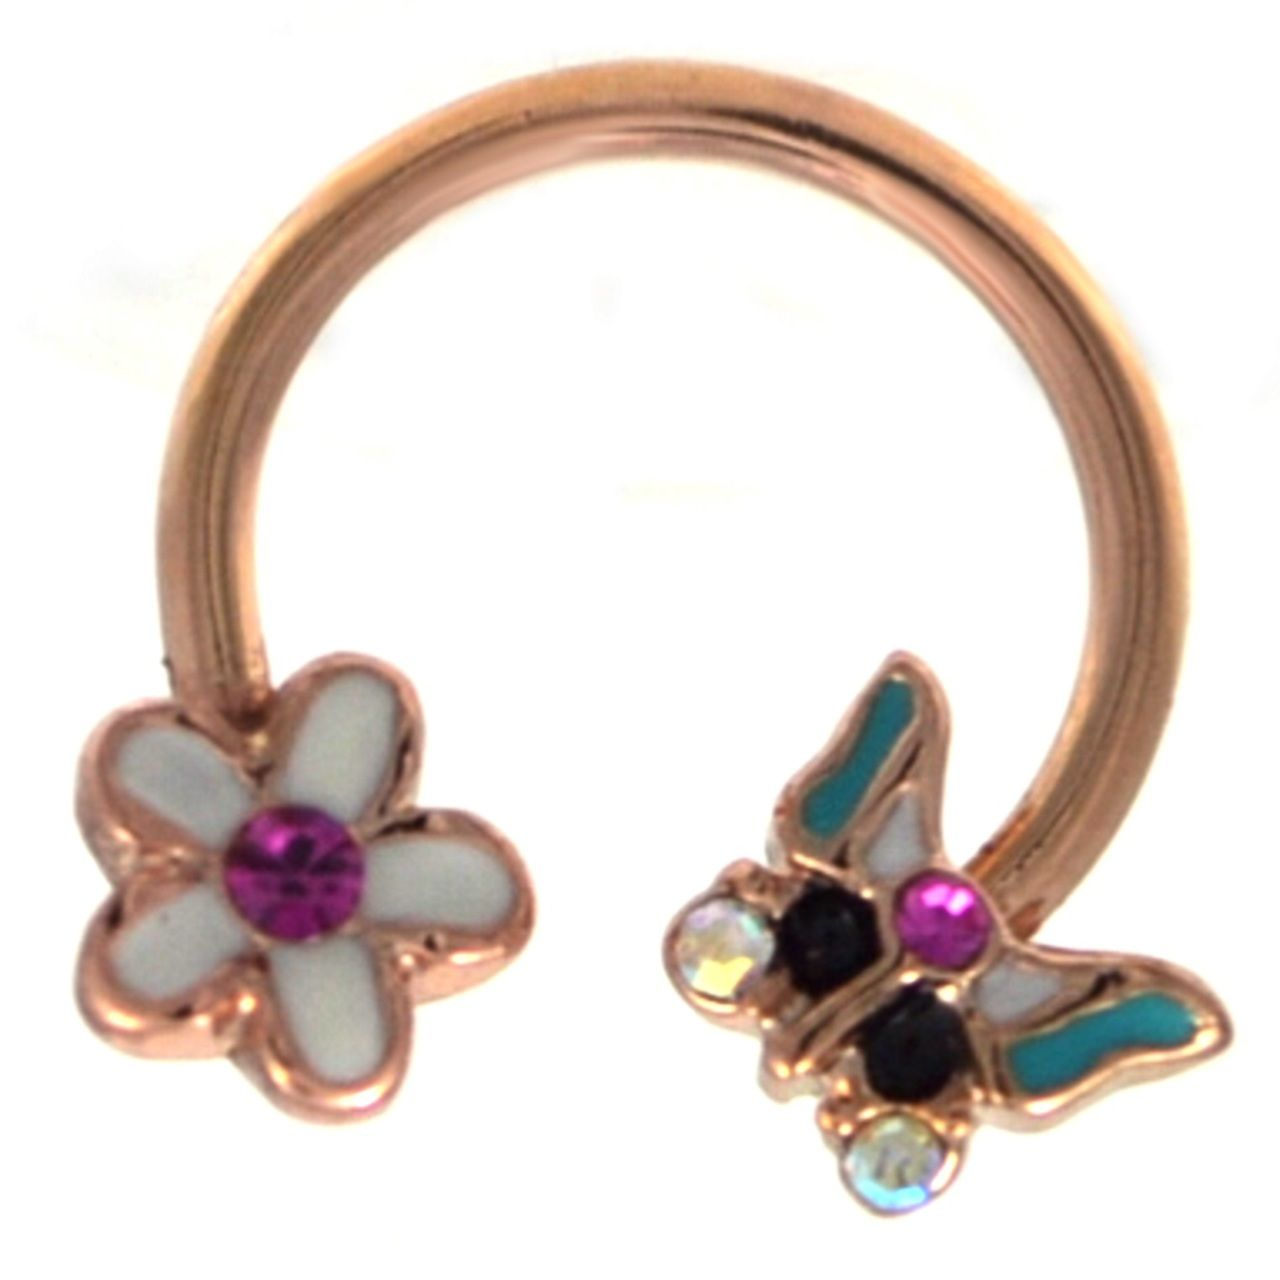 Body piercing retainer  Flower u Butterfly Rose Goldtone Horseshoe Ring  Pinterest